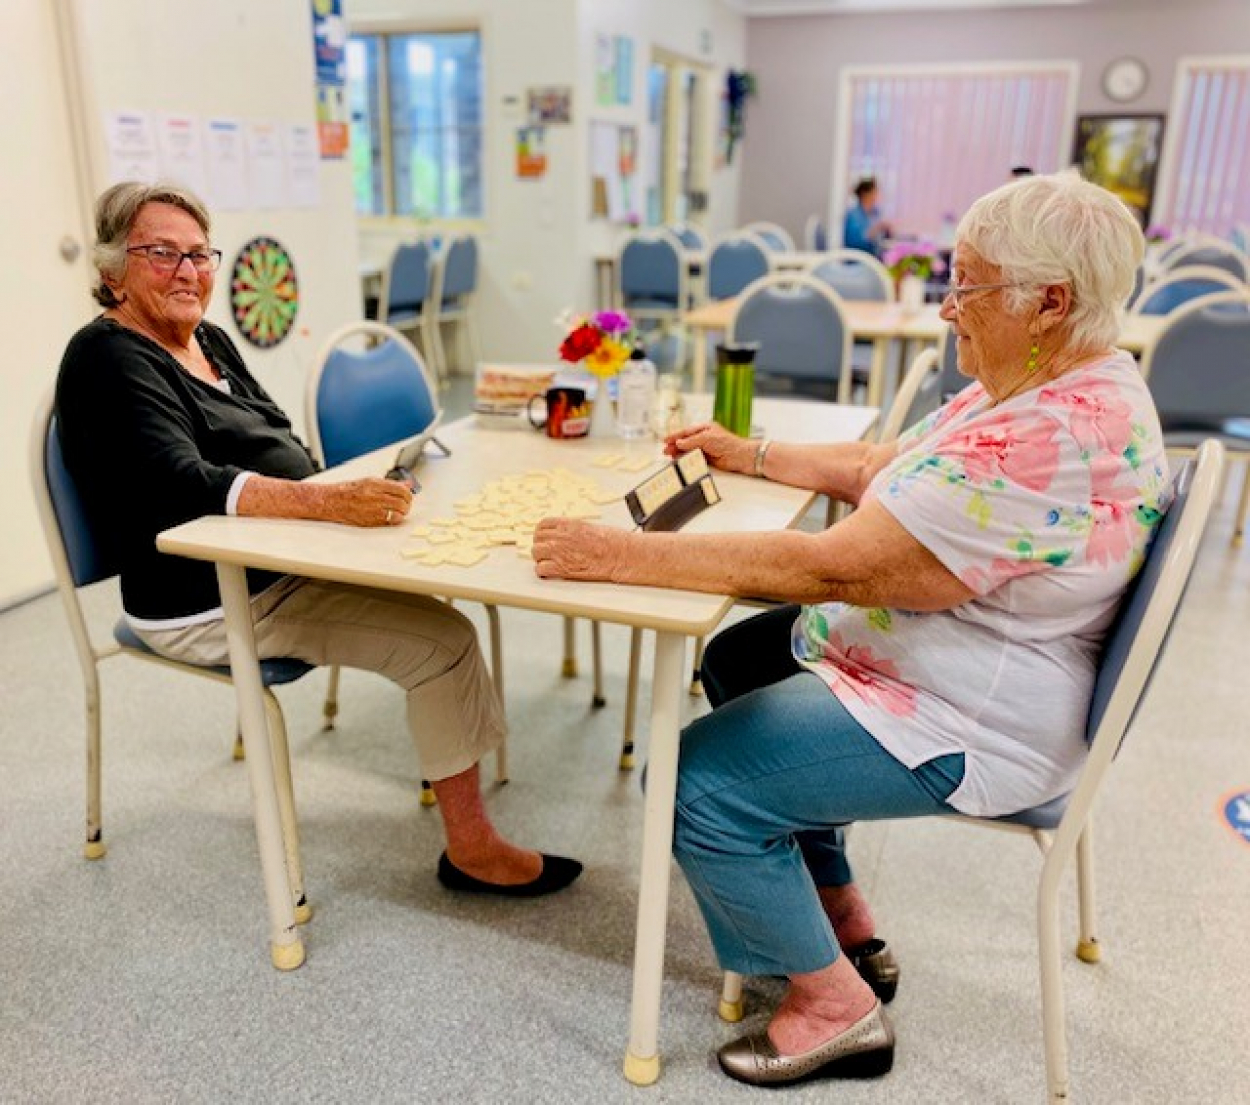 Eureka Rockhampton – Affordable and Flexible Rental Retirement Living 341-351   Dean Street - Frenchville 4701 Retirement Property for Rental